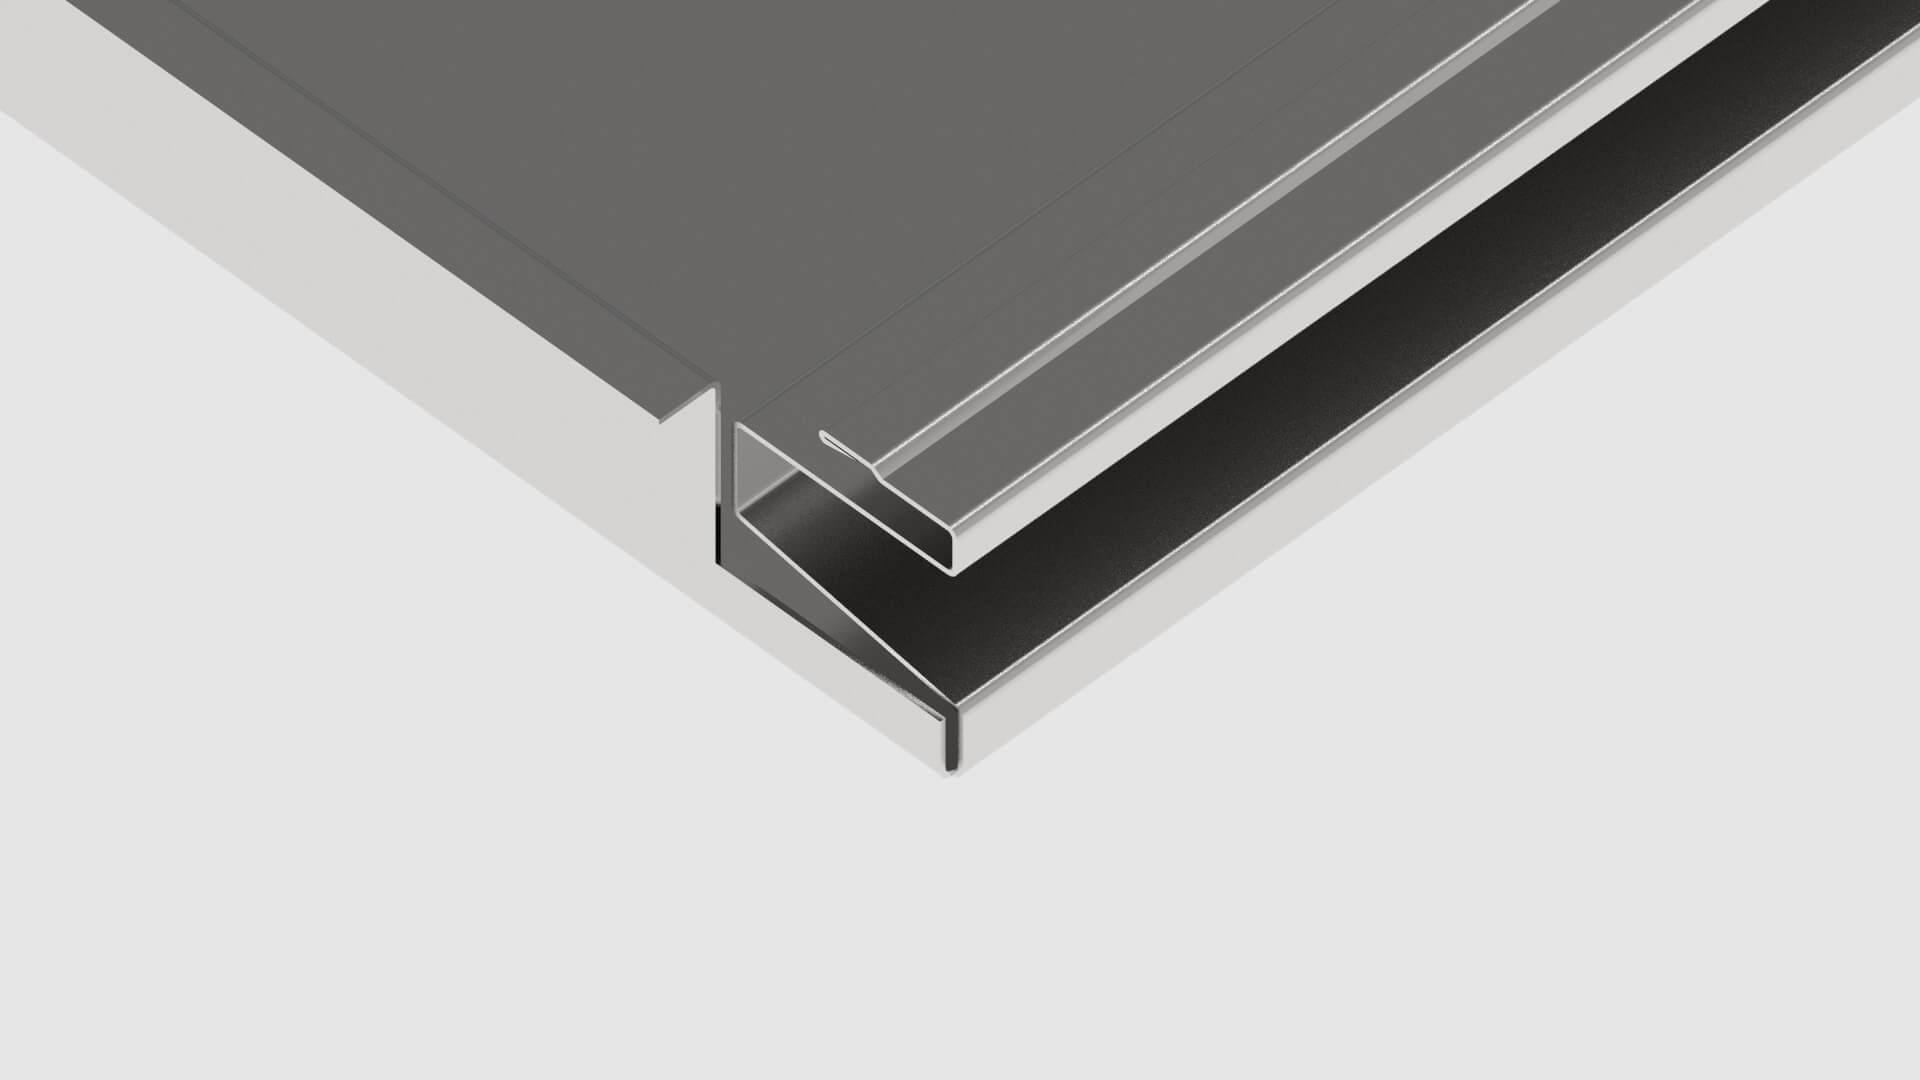 systeemwand-panelen-product-2.jpg